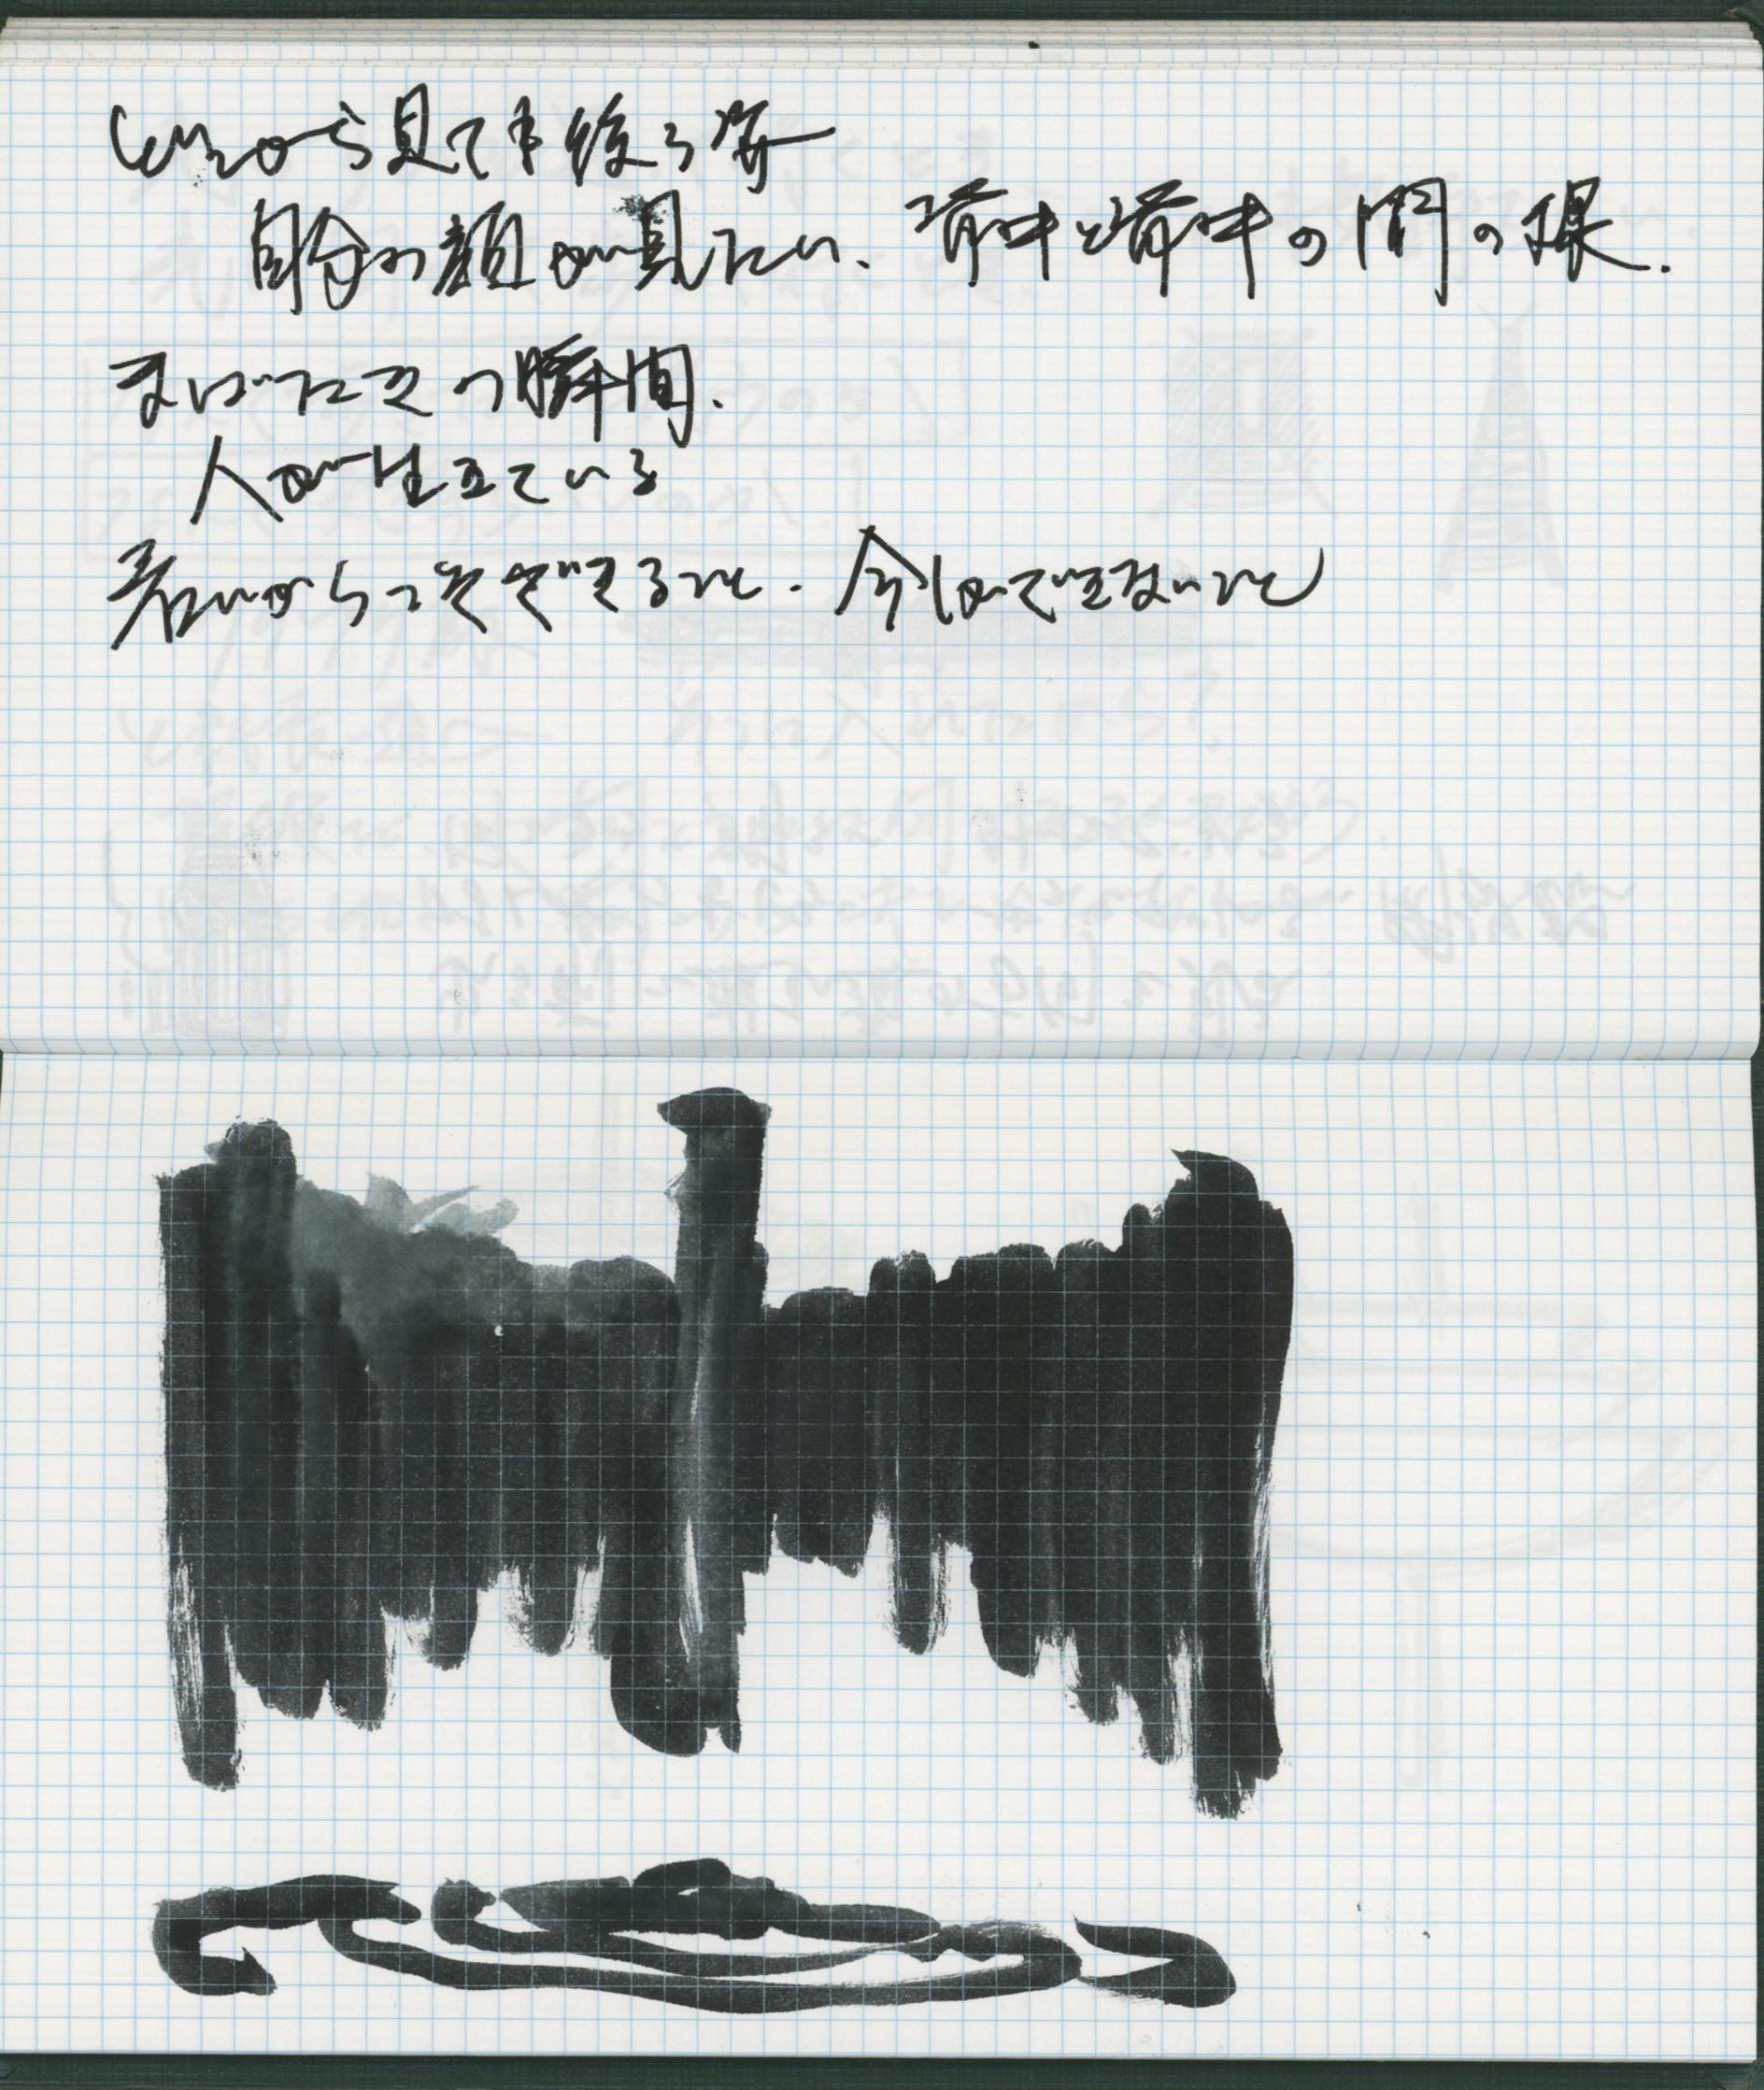 img582.jpg